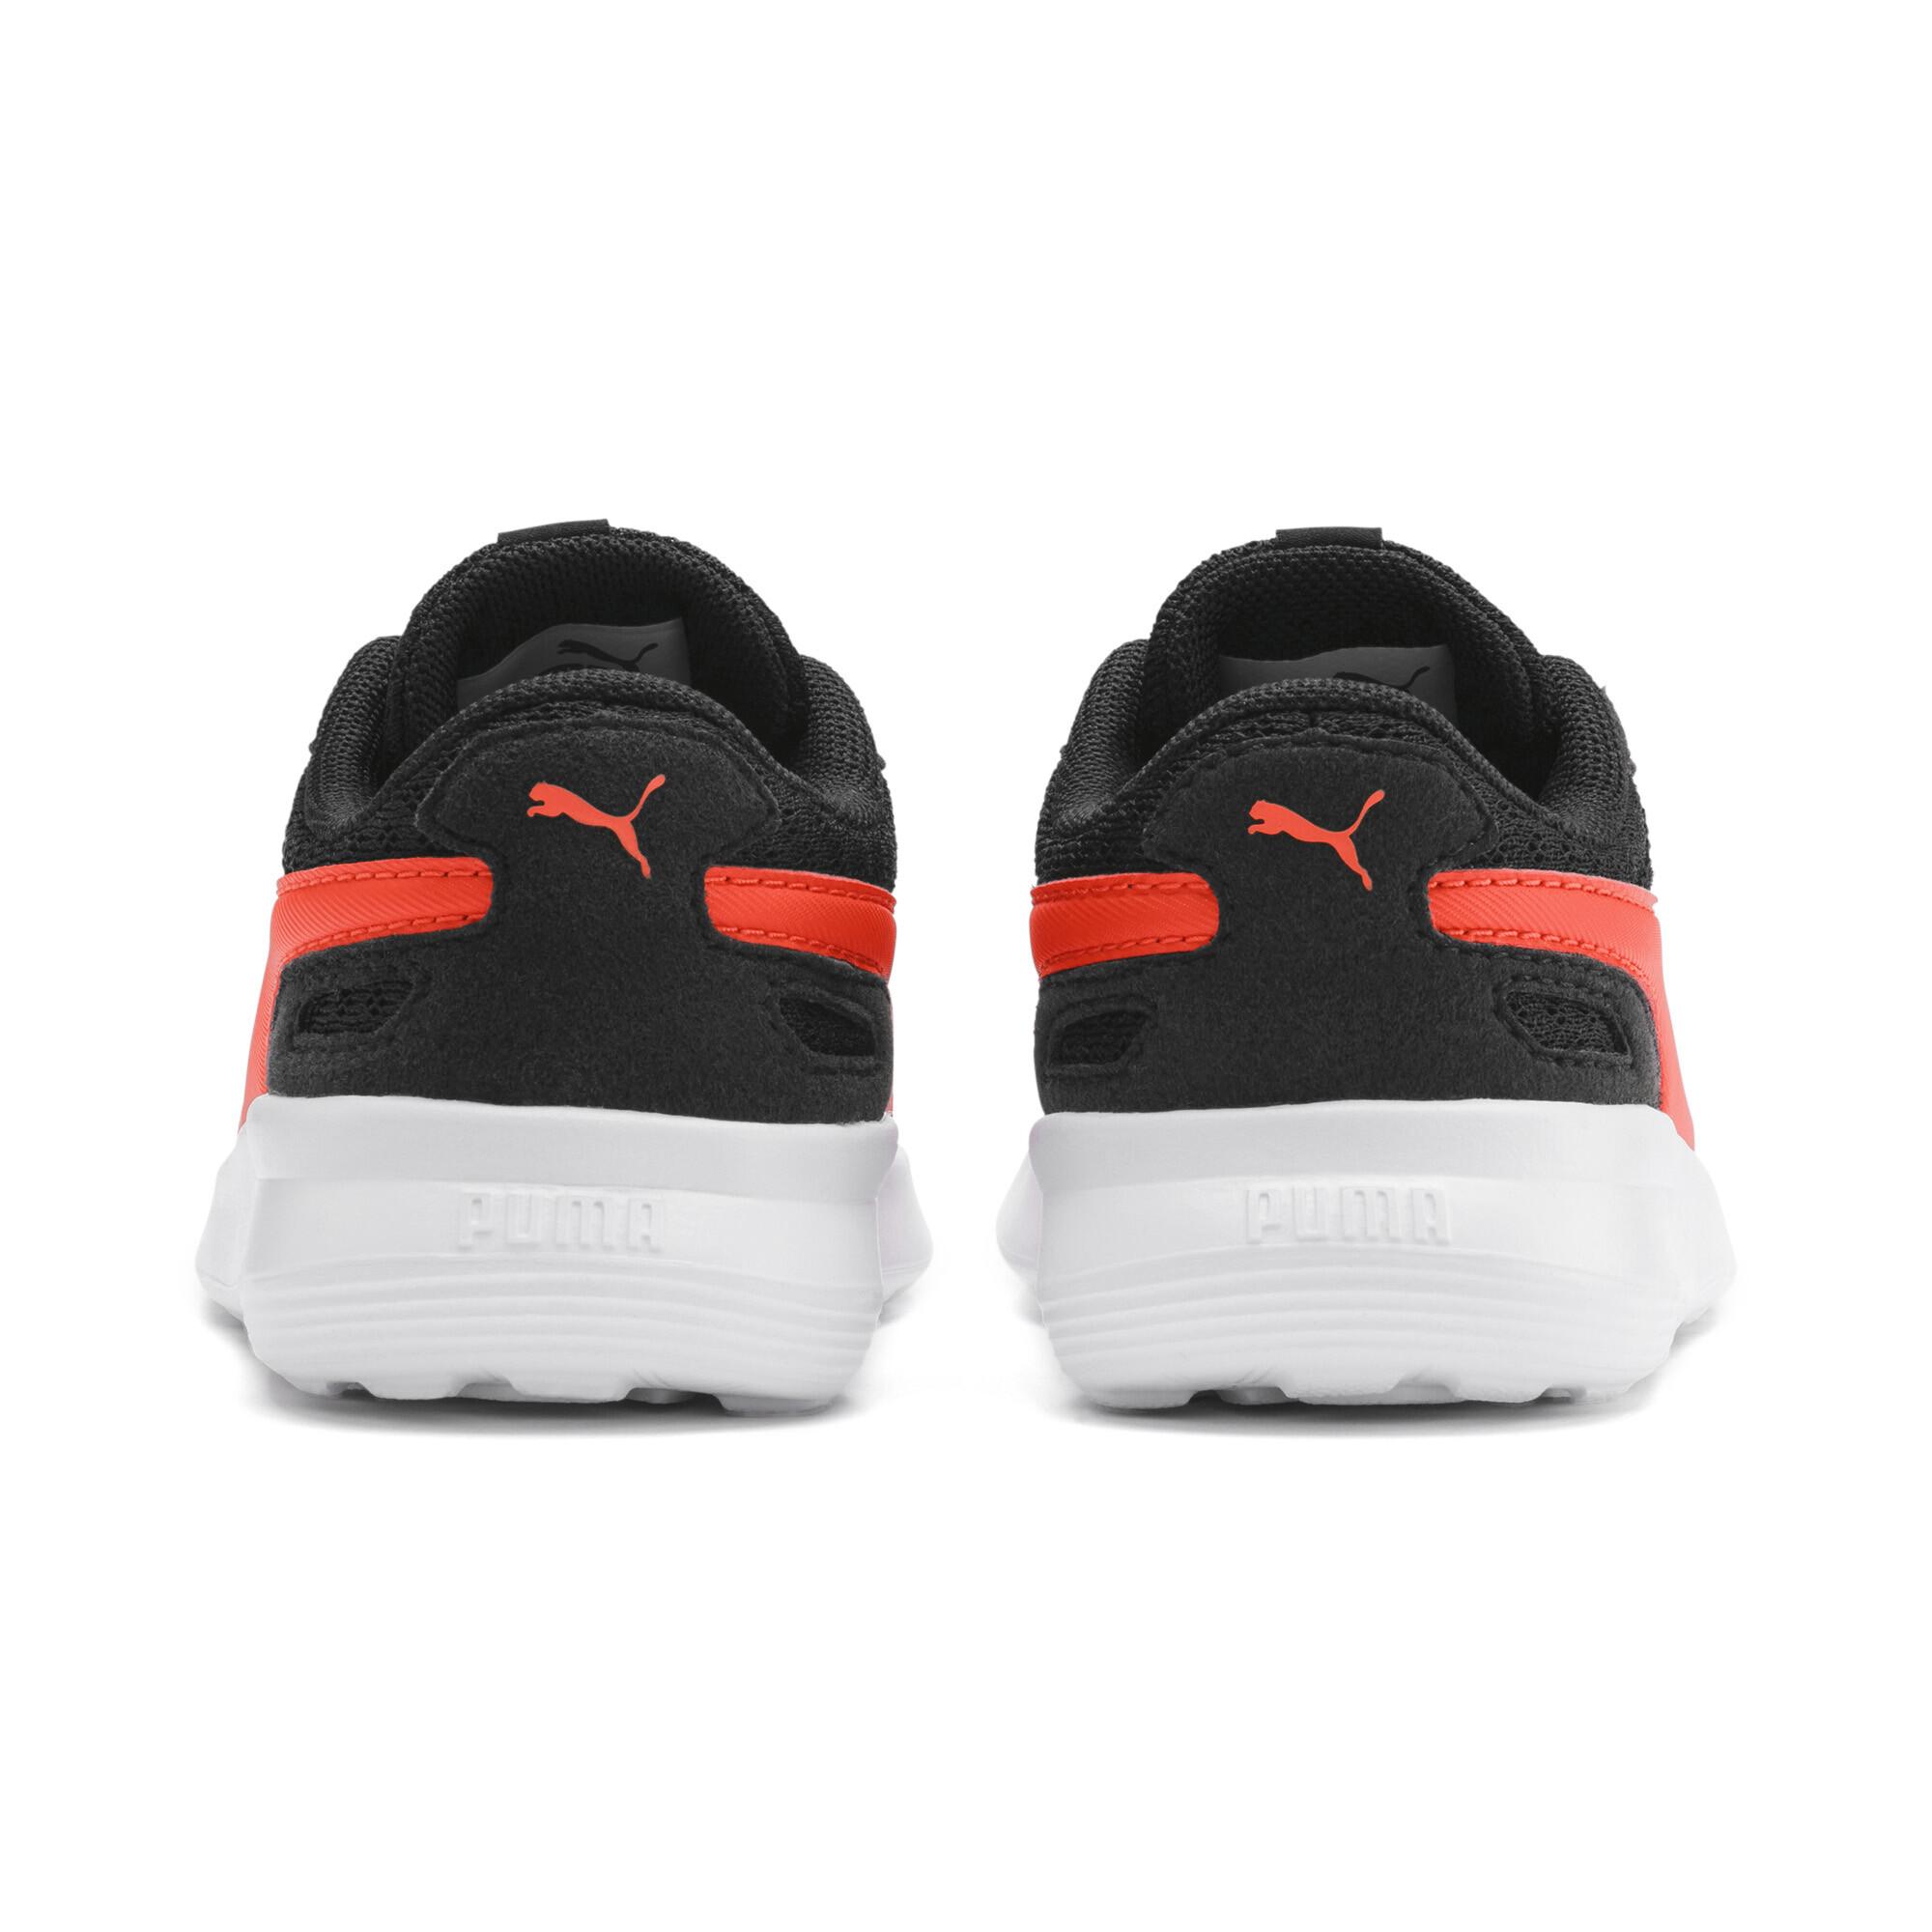 PUMA-ST-Activate-AC-Toddler-Shoes-Kids-Shoe-Kids thumbnail 15